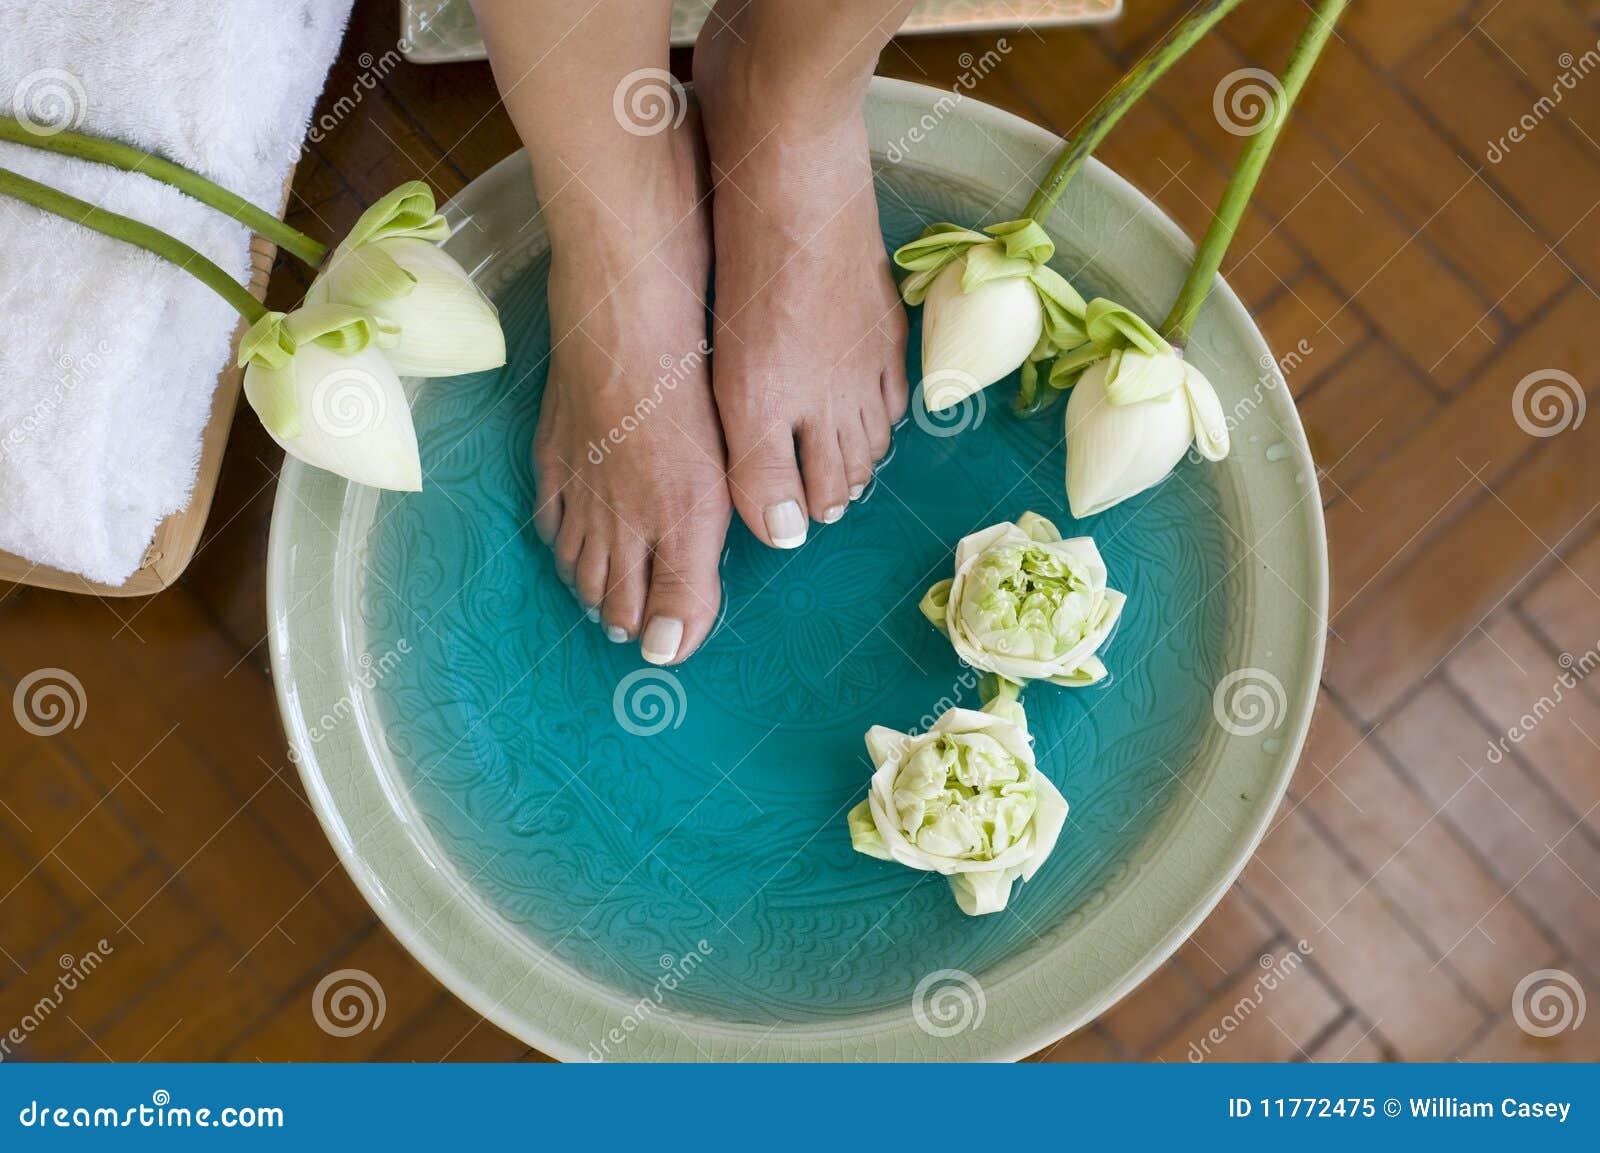 Lotus flower aromatherapy spa for feet 2 stock image image of download lotus flower aromatherapy spa for feet 2 stock image image of aromatherapy relax mightylinksfo